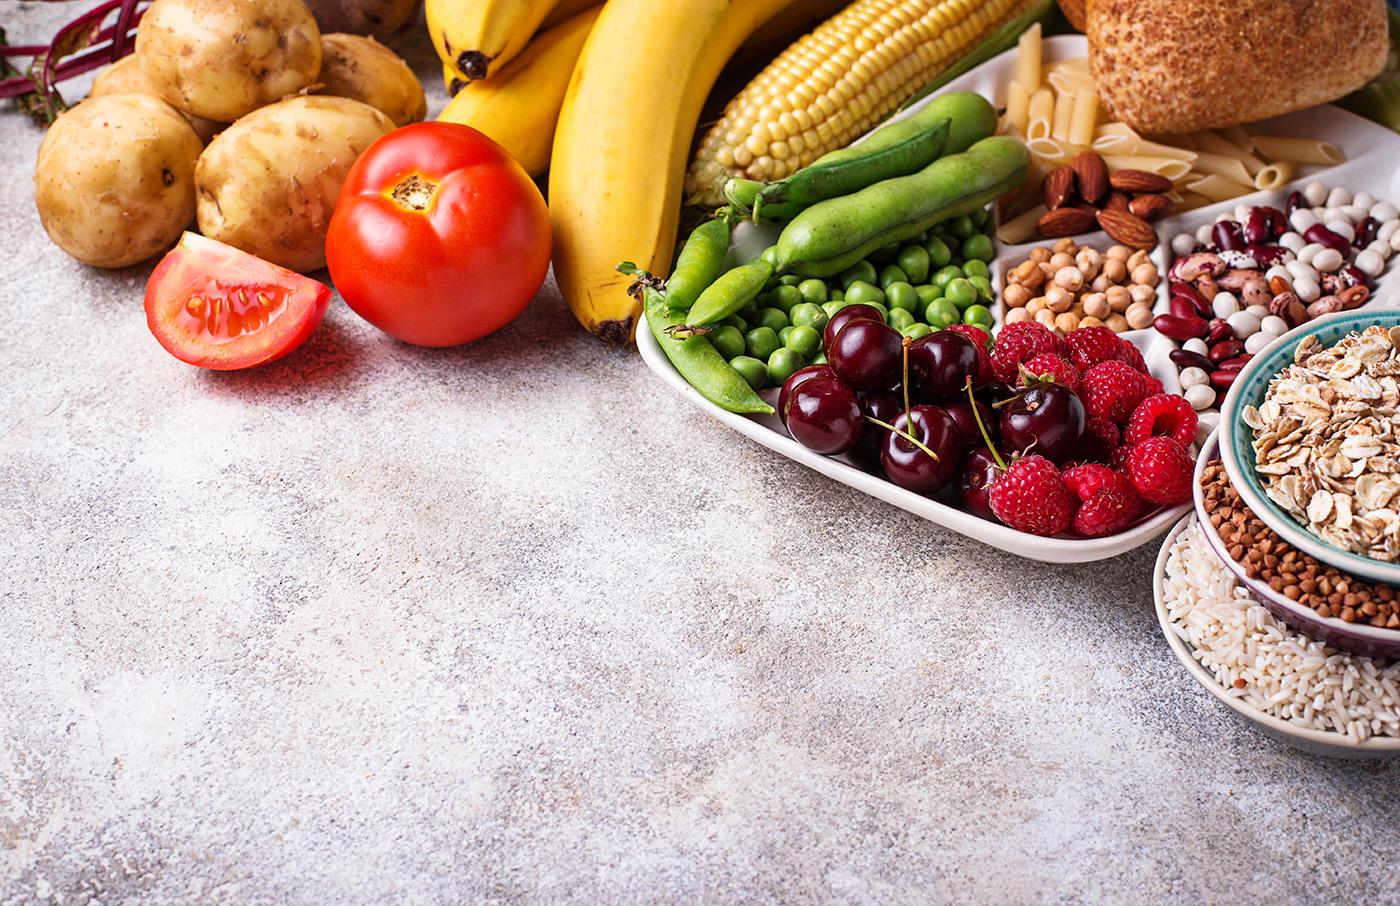 ch szegény diéta regenor tabletta